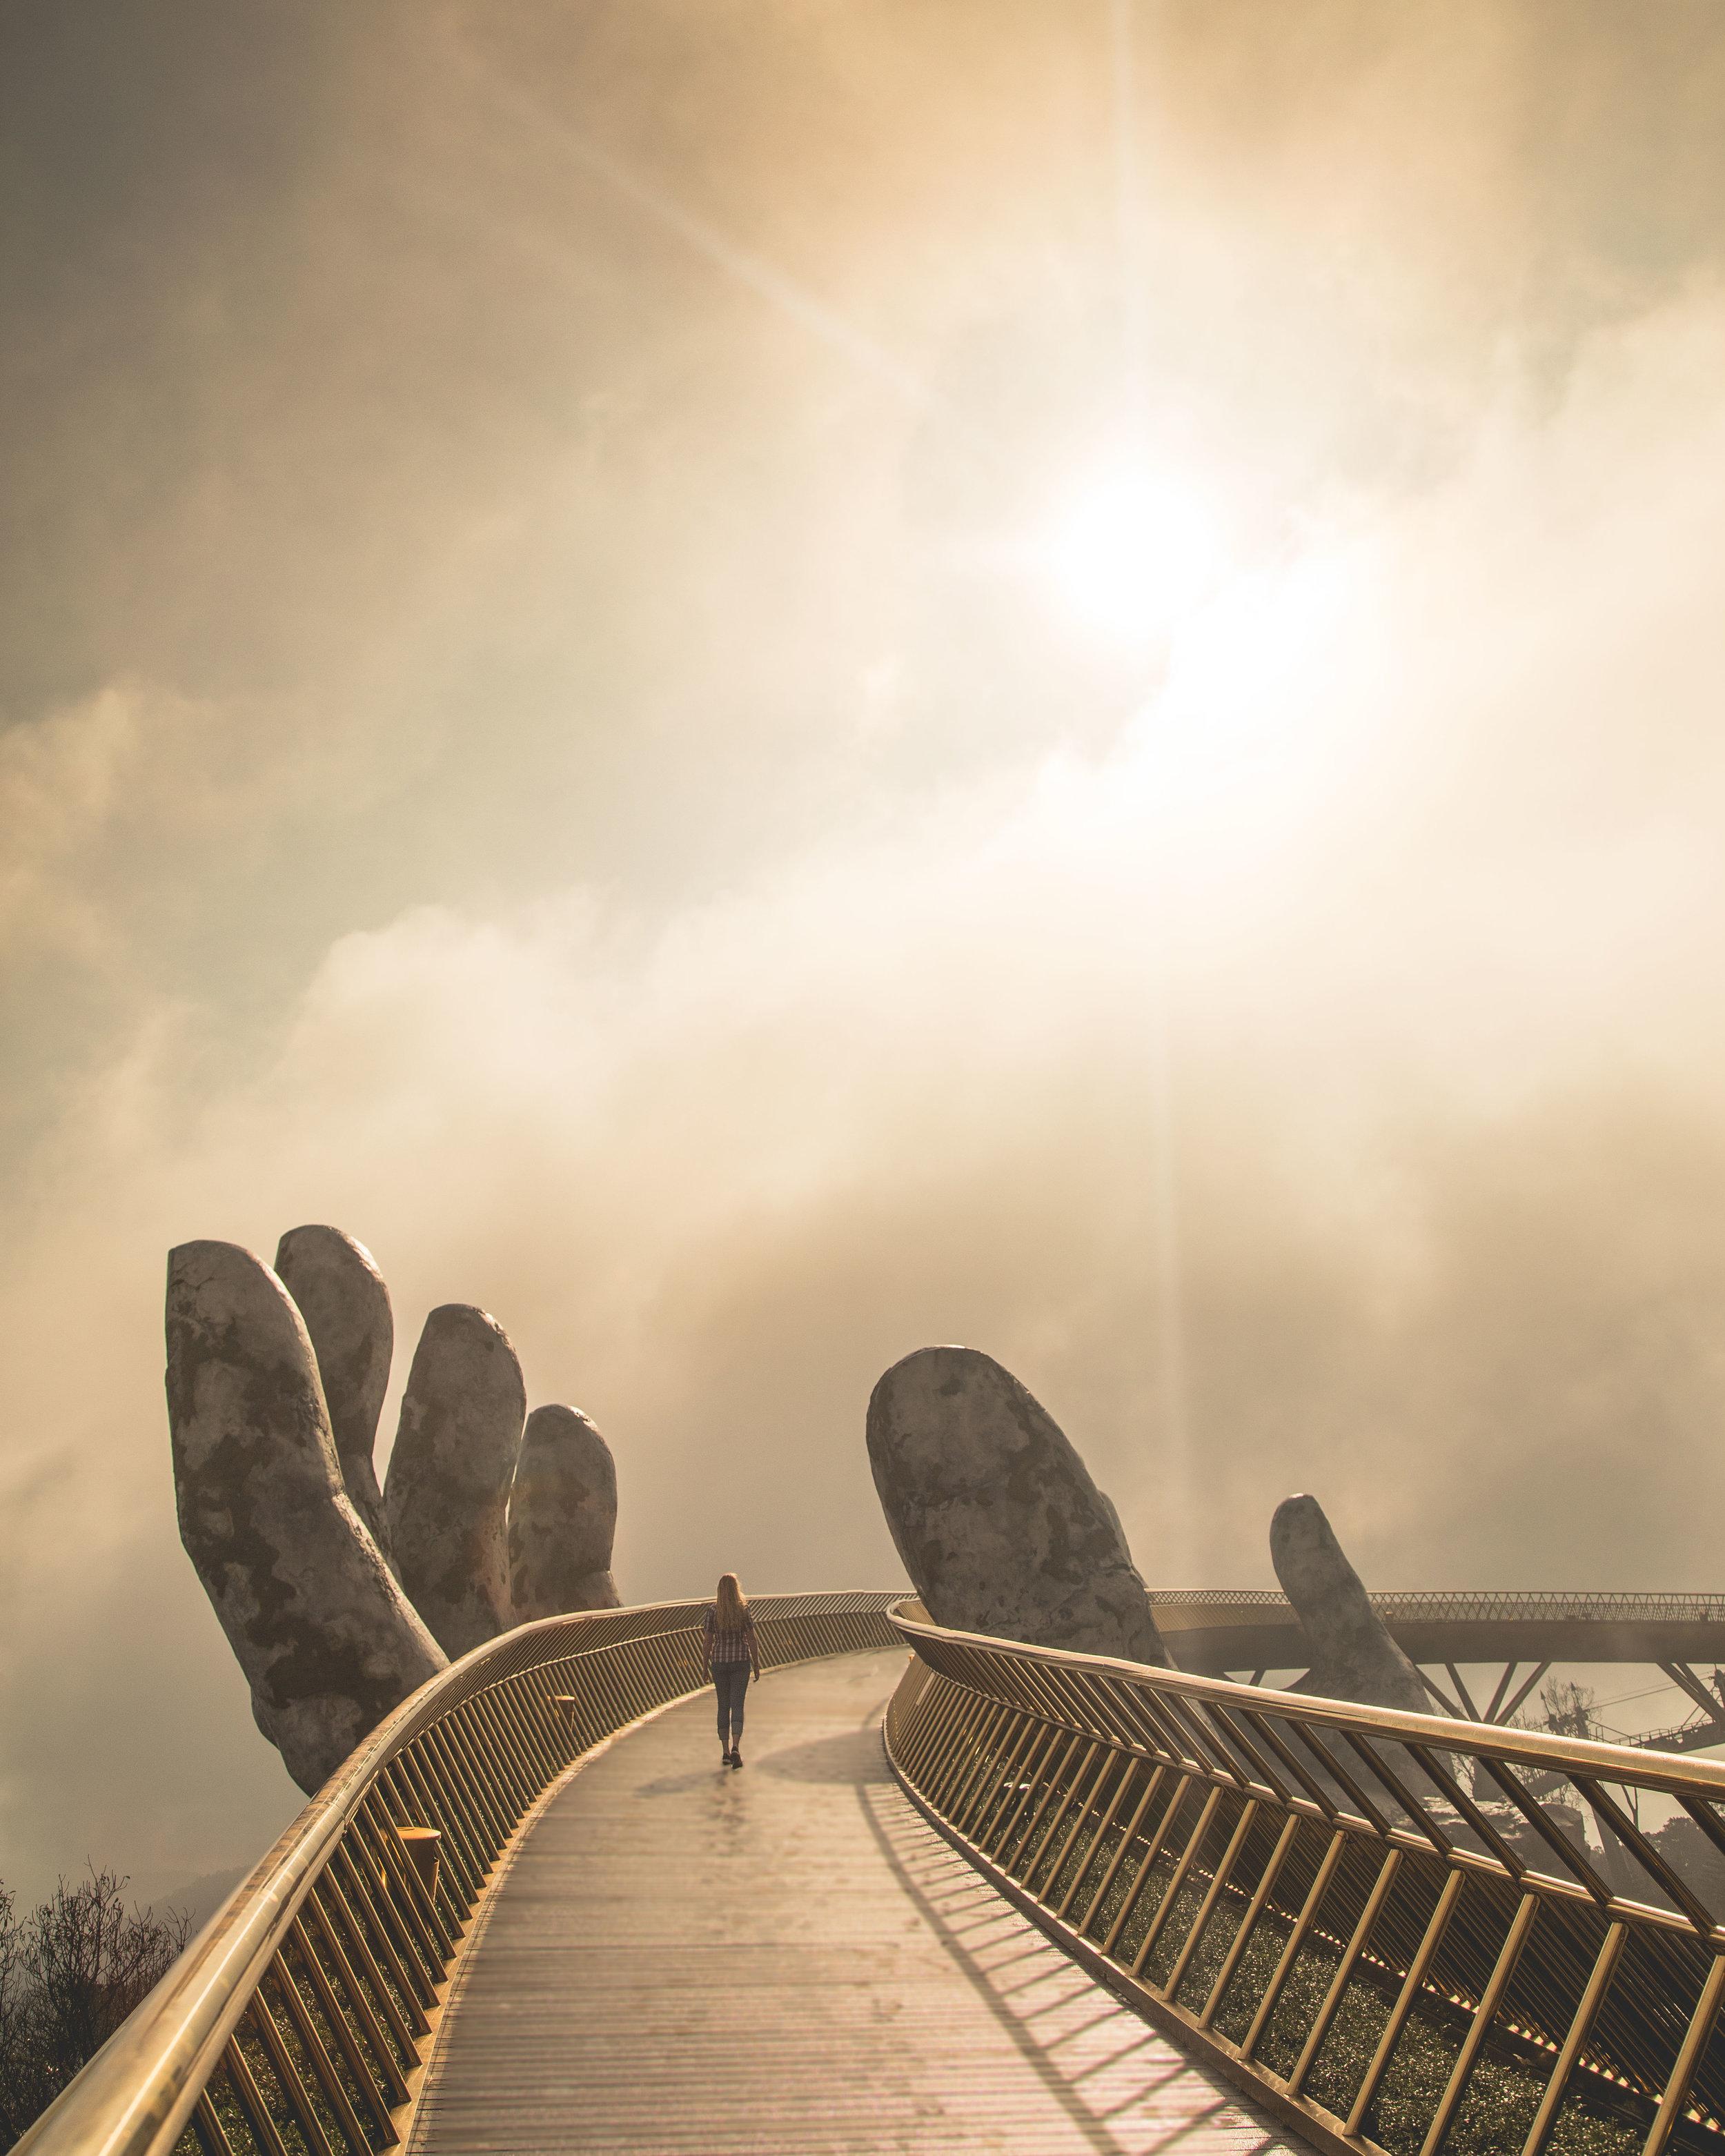 What to do in Da Nang - Golden Hand Bridge at Ba Na Hills